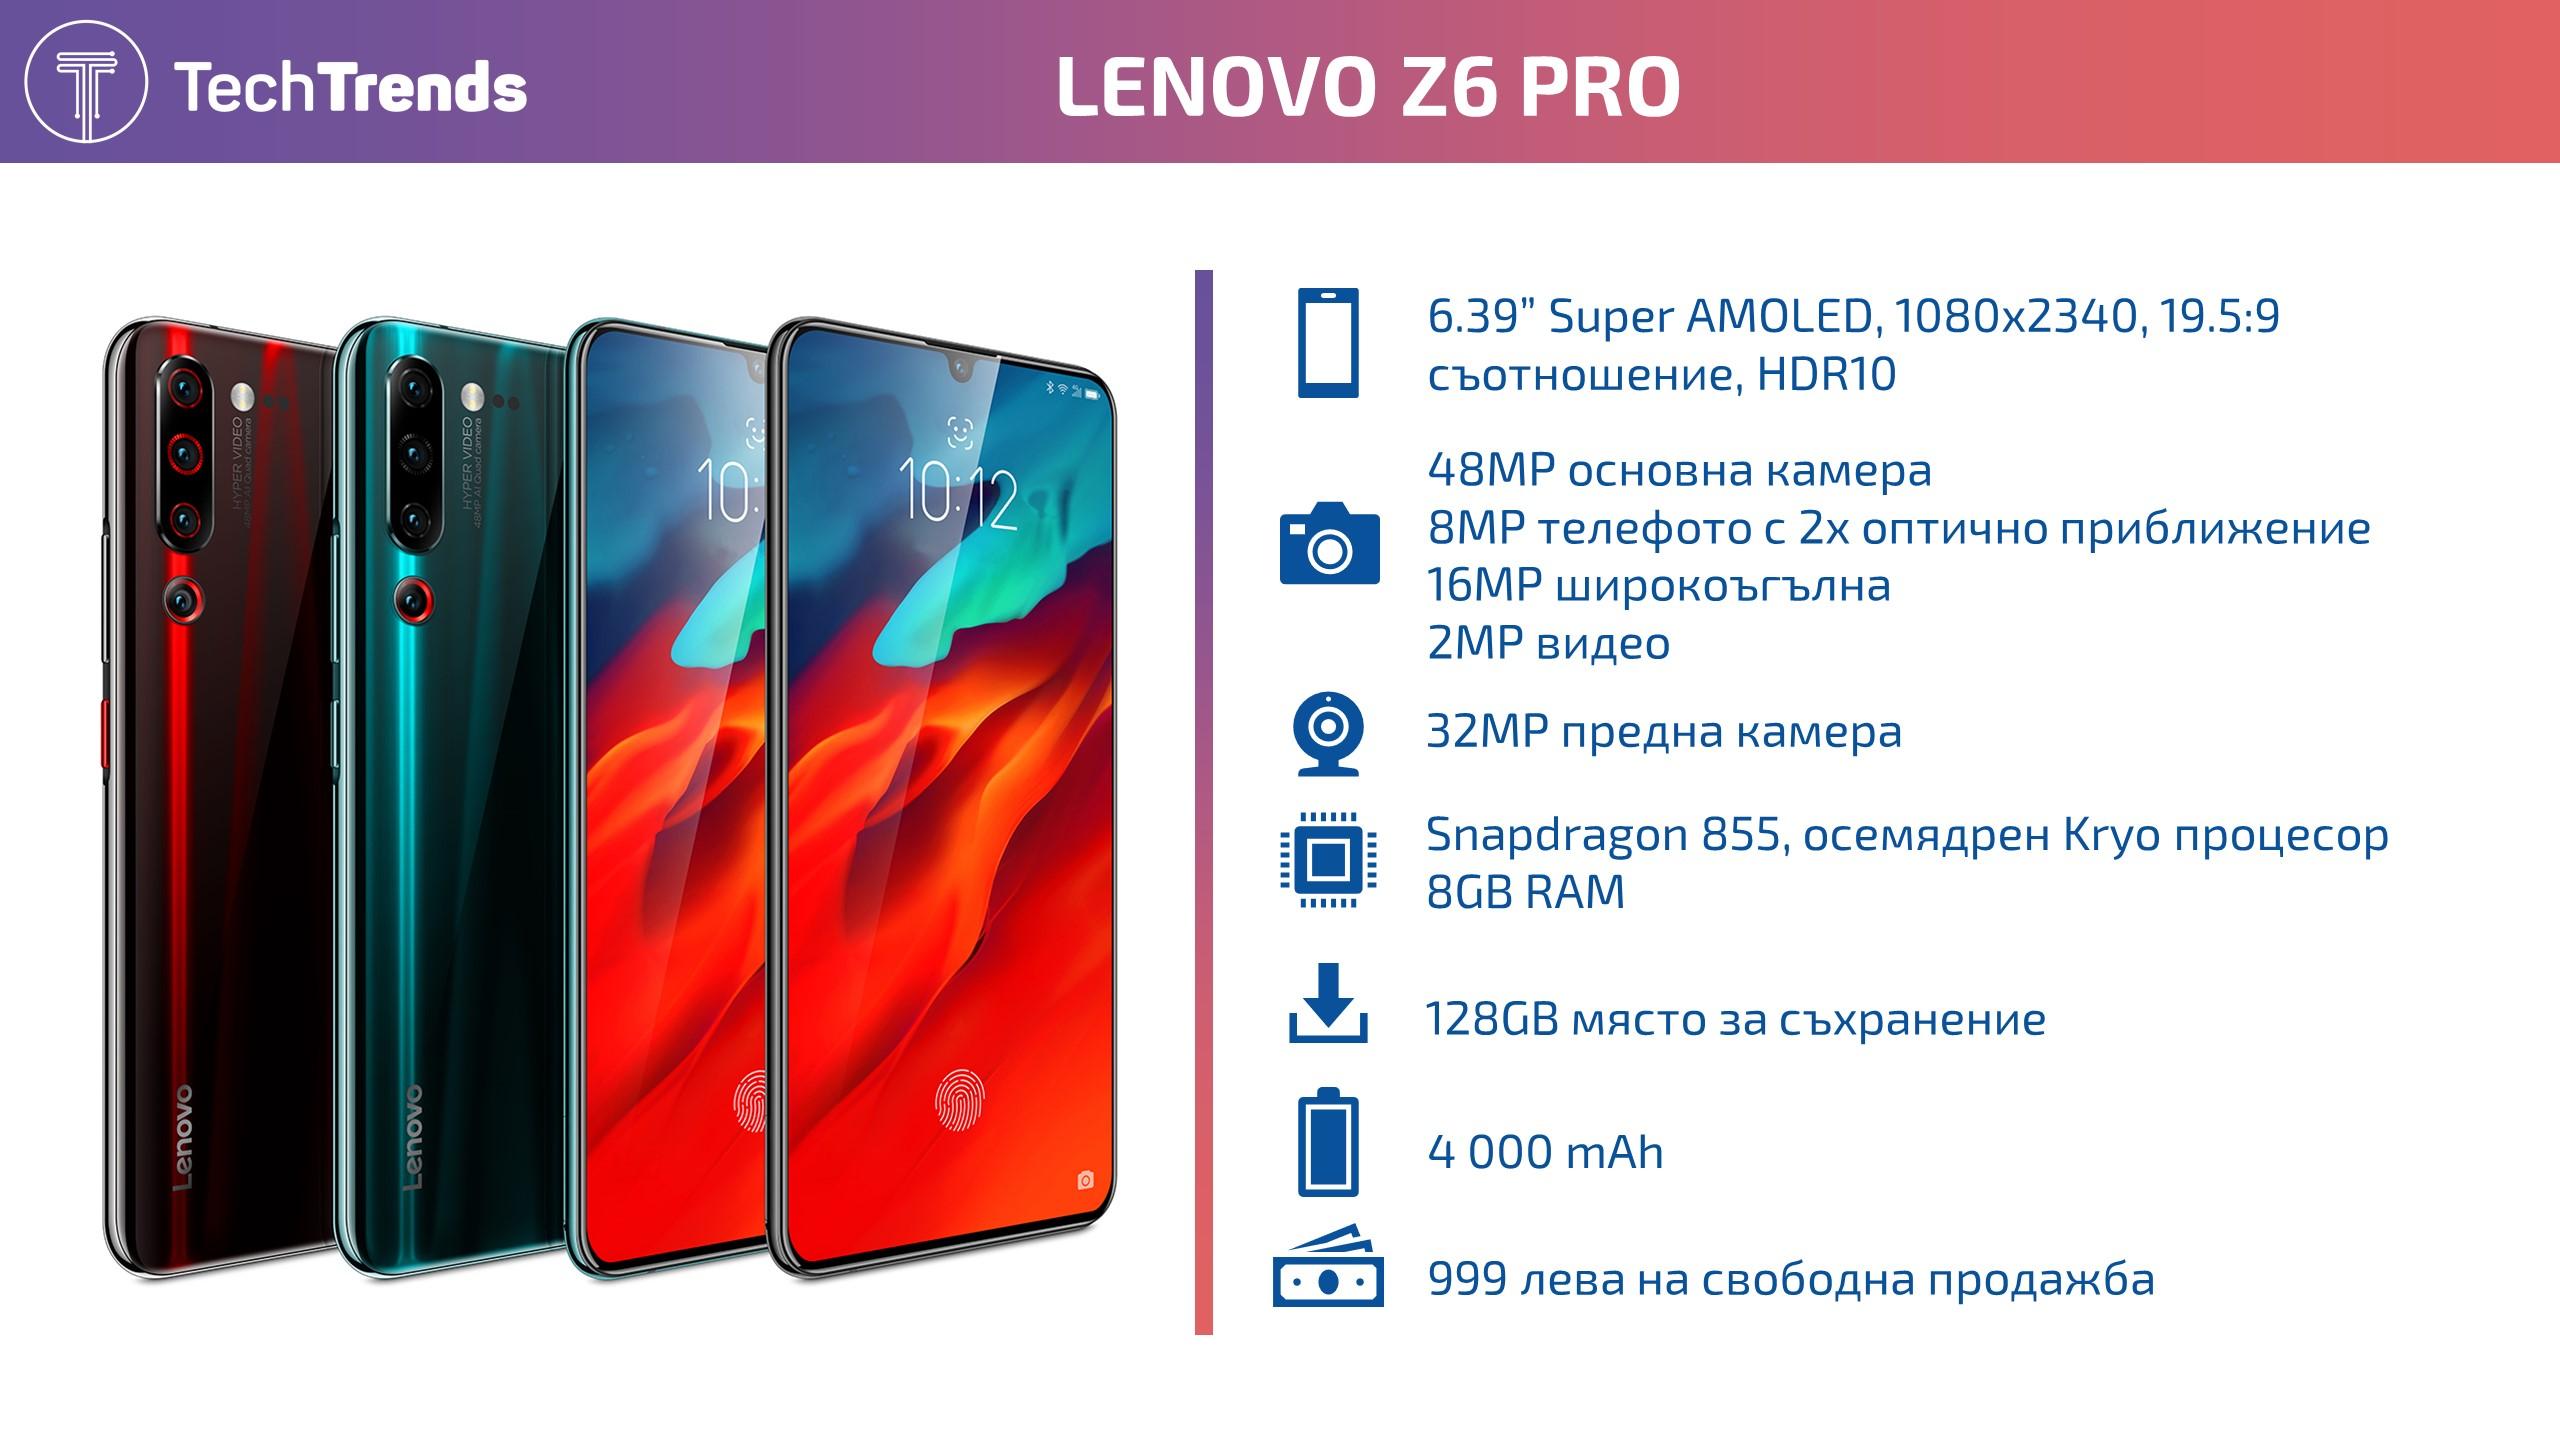 Lenovo Z6 Pro Infographic